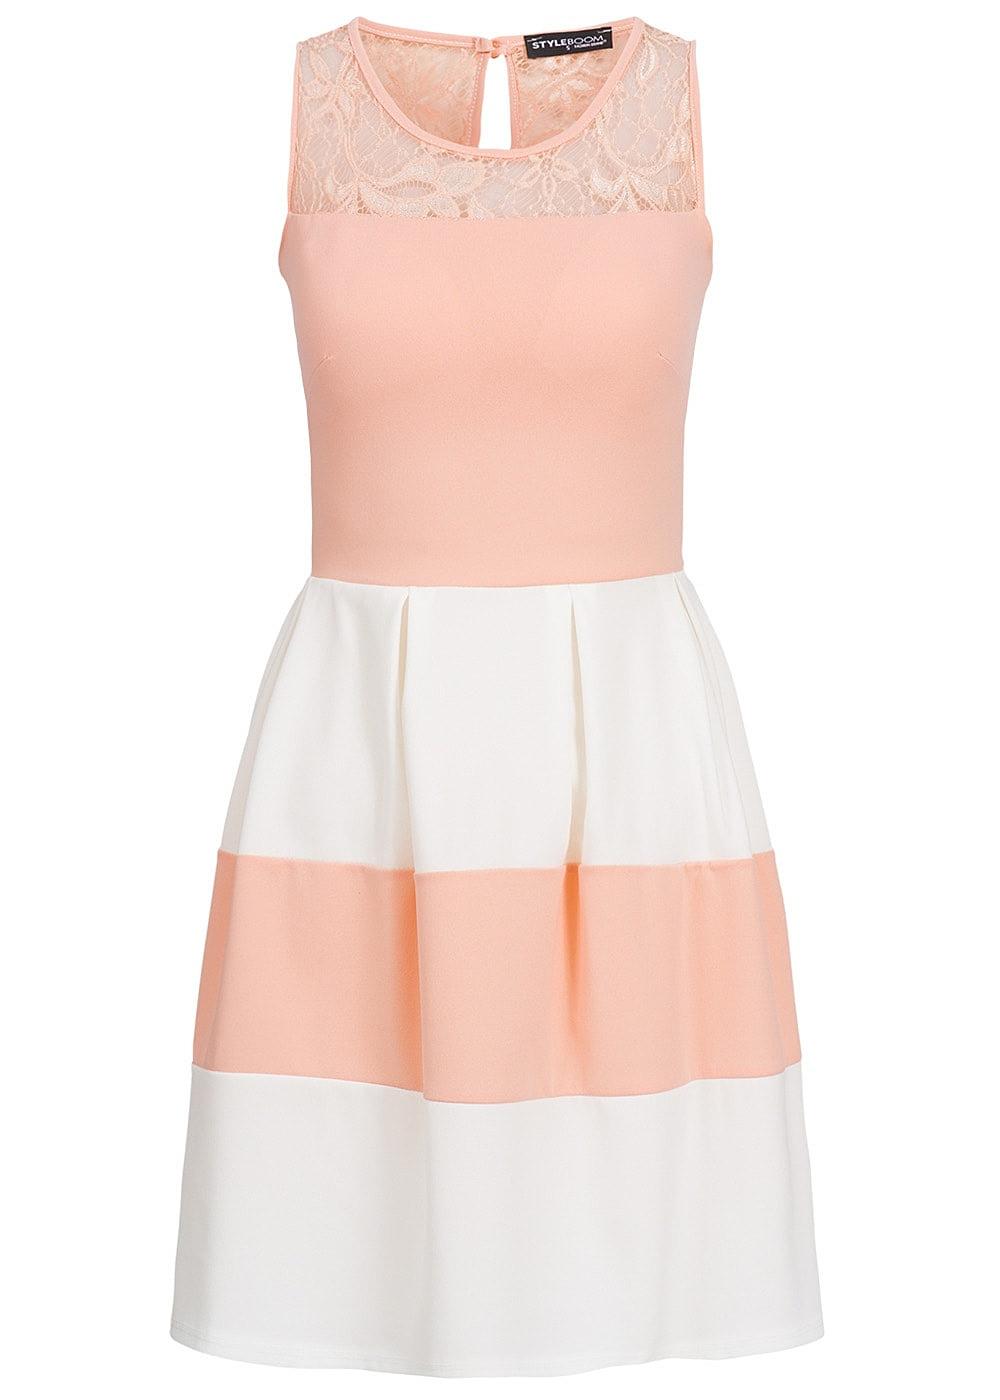 20 Genial Kleid Spitze Rosa ÄrmelDesigner Genial Kleid Spitze Rosa Stylish